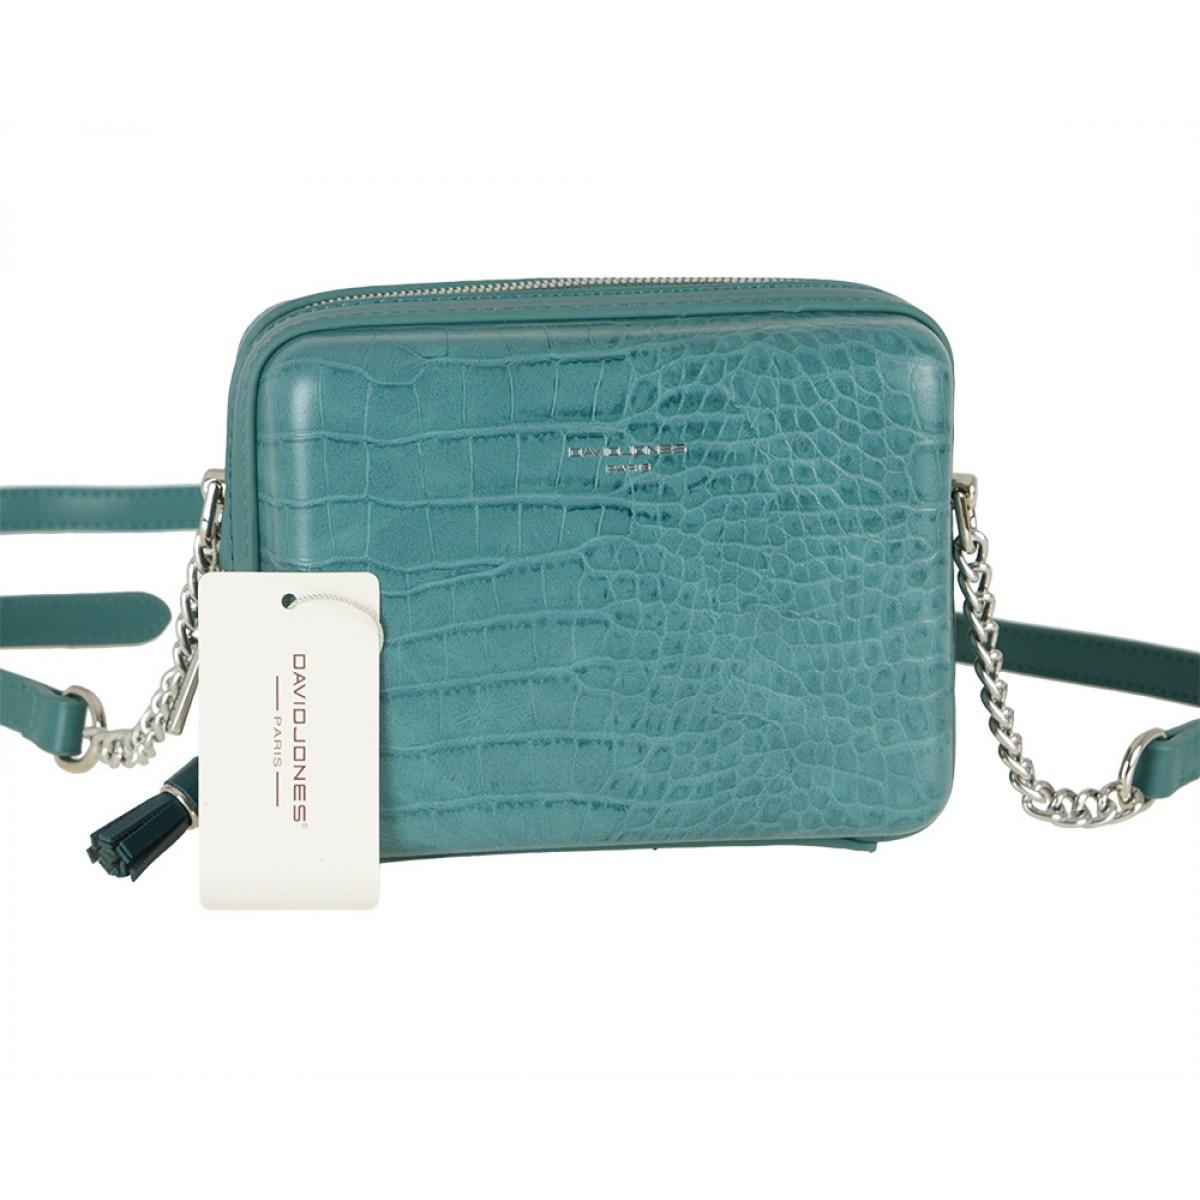 Жіноча сумка David Jones CM5660 BLUE GREEN